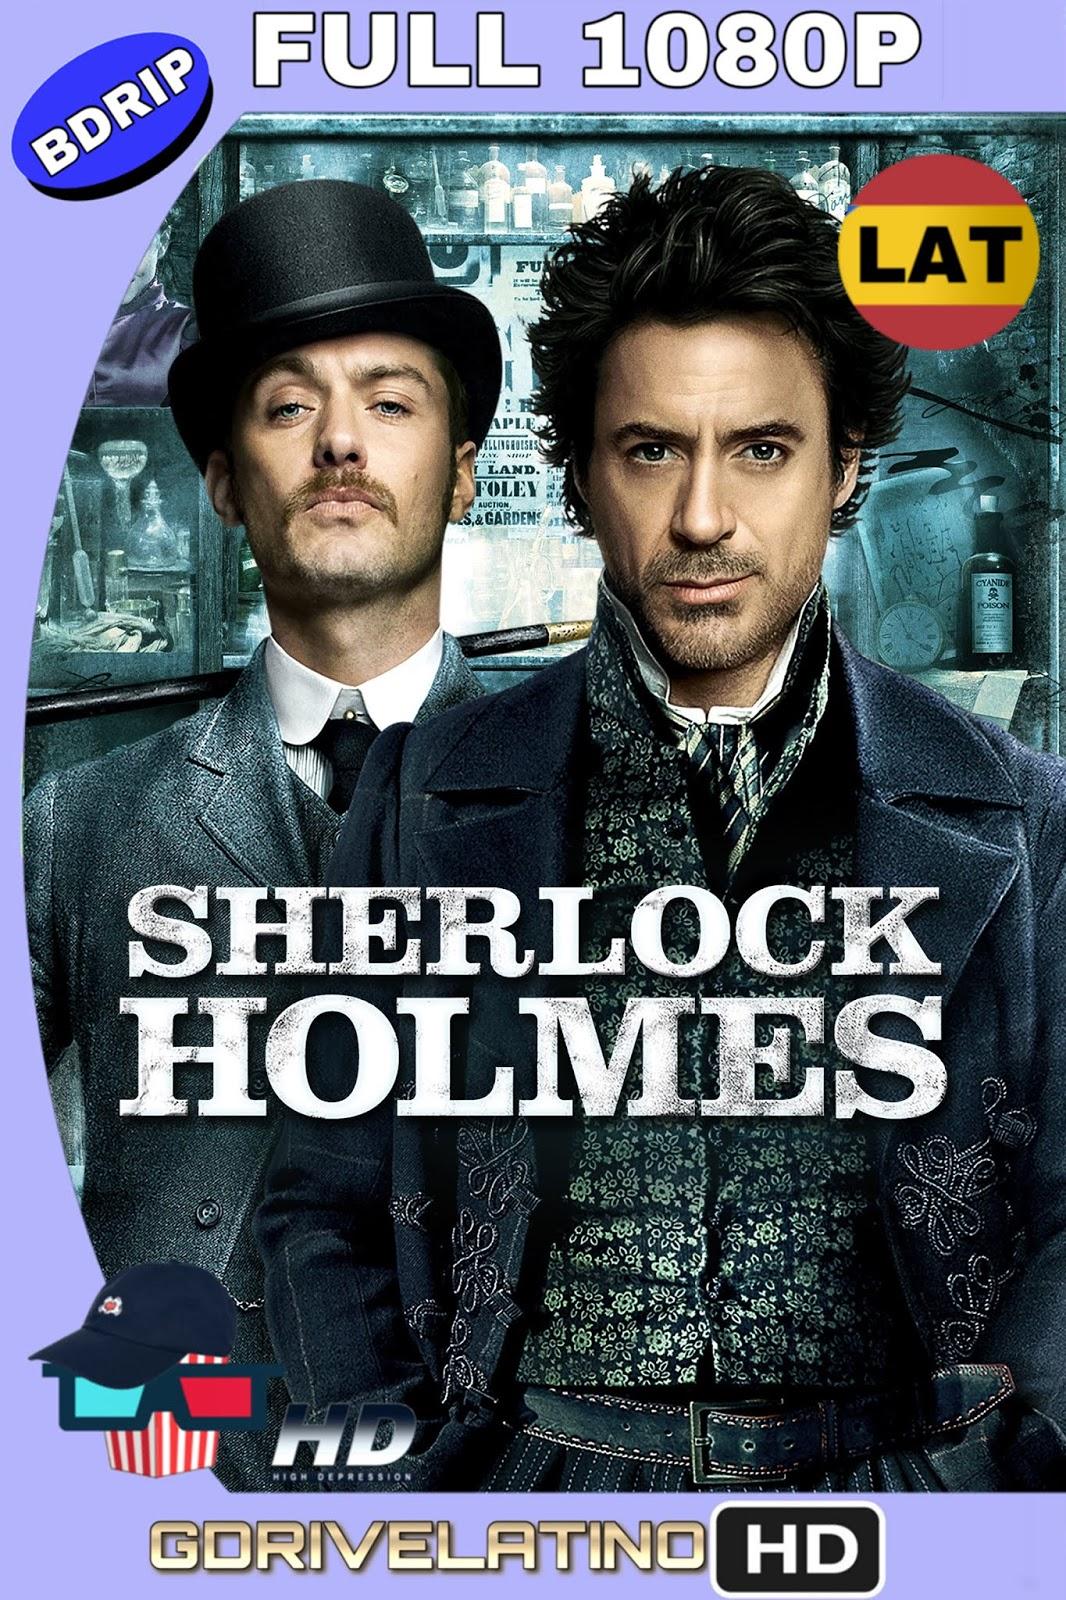 Sherlock Holmes (2009) BDRip FULL 1080p (Latino – Inglés) MKV